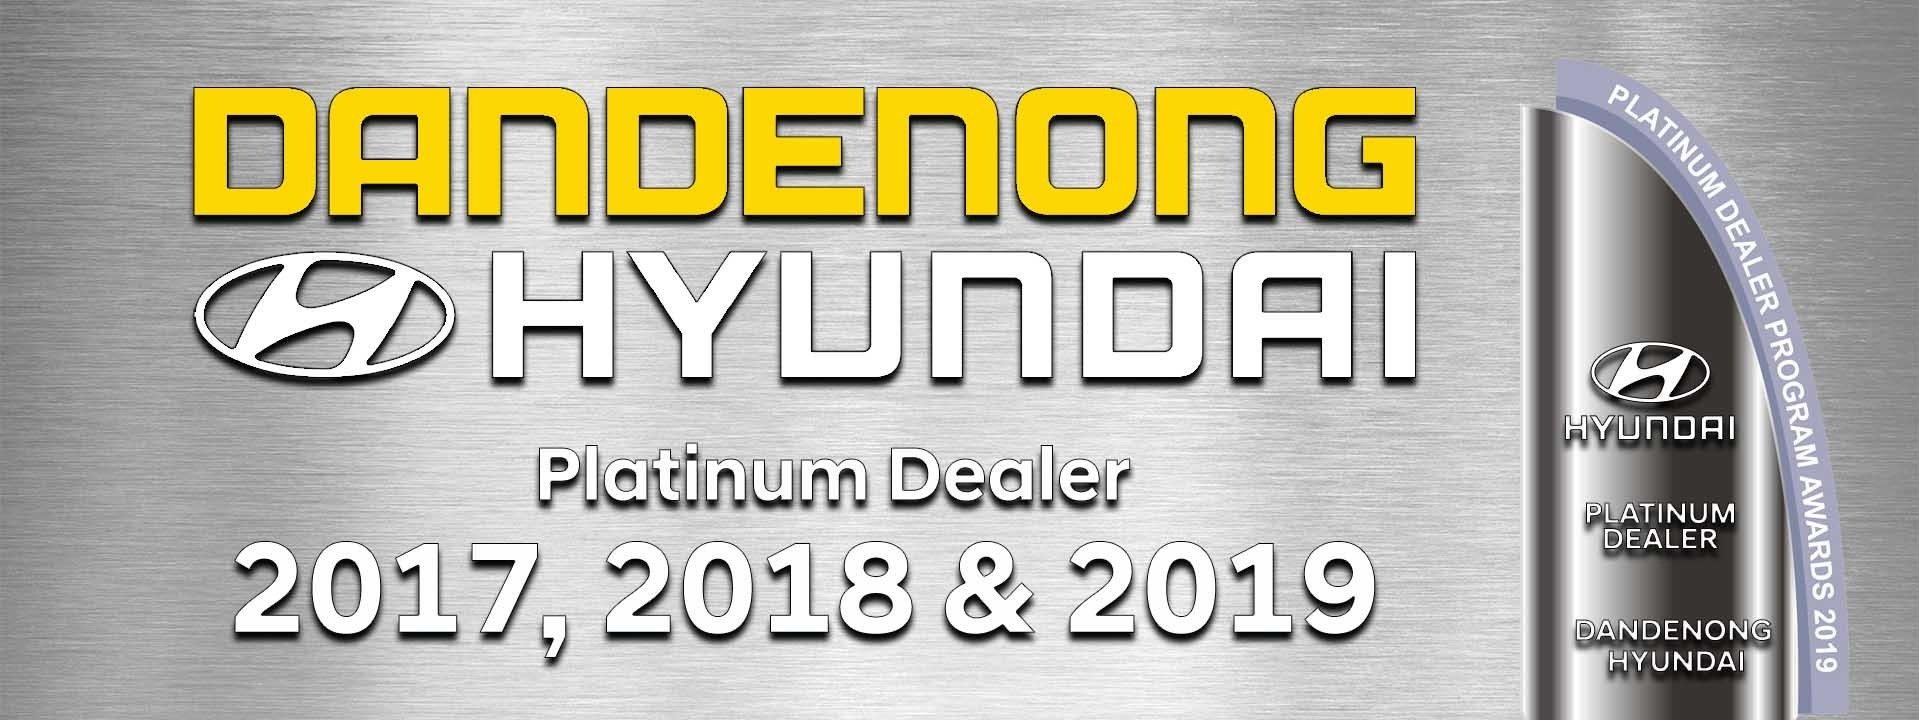 Dandenong Hyundai - Platinum Dealer banner